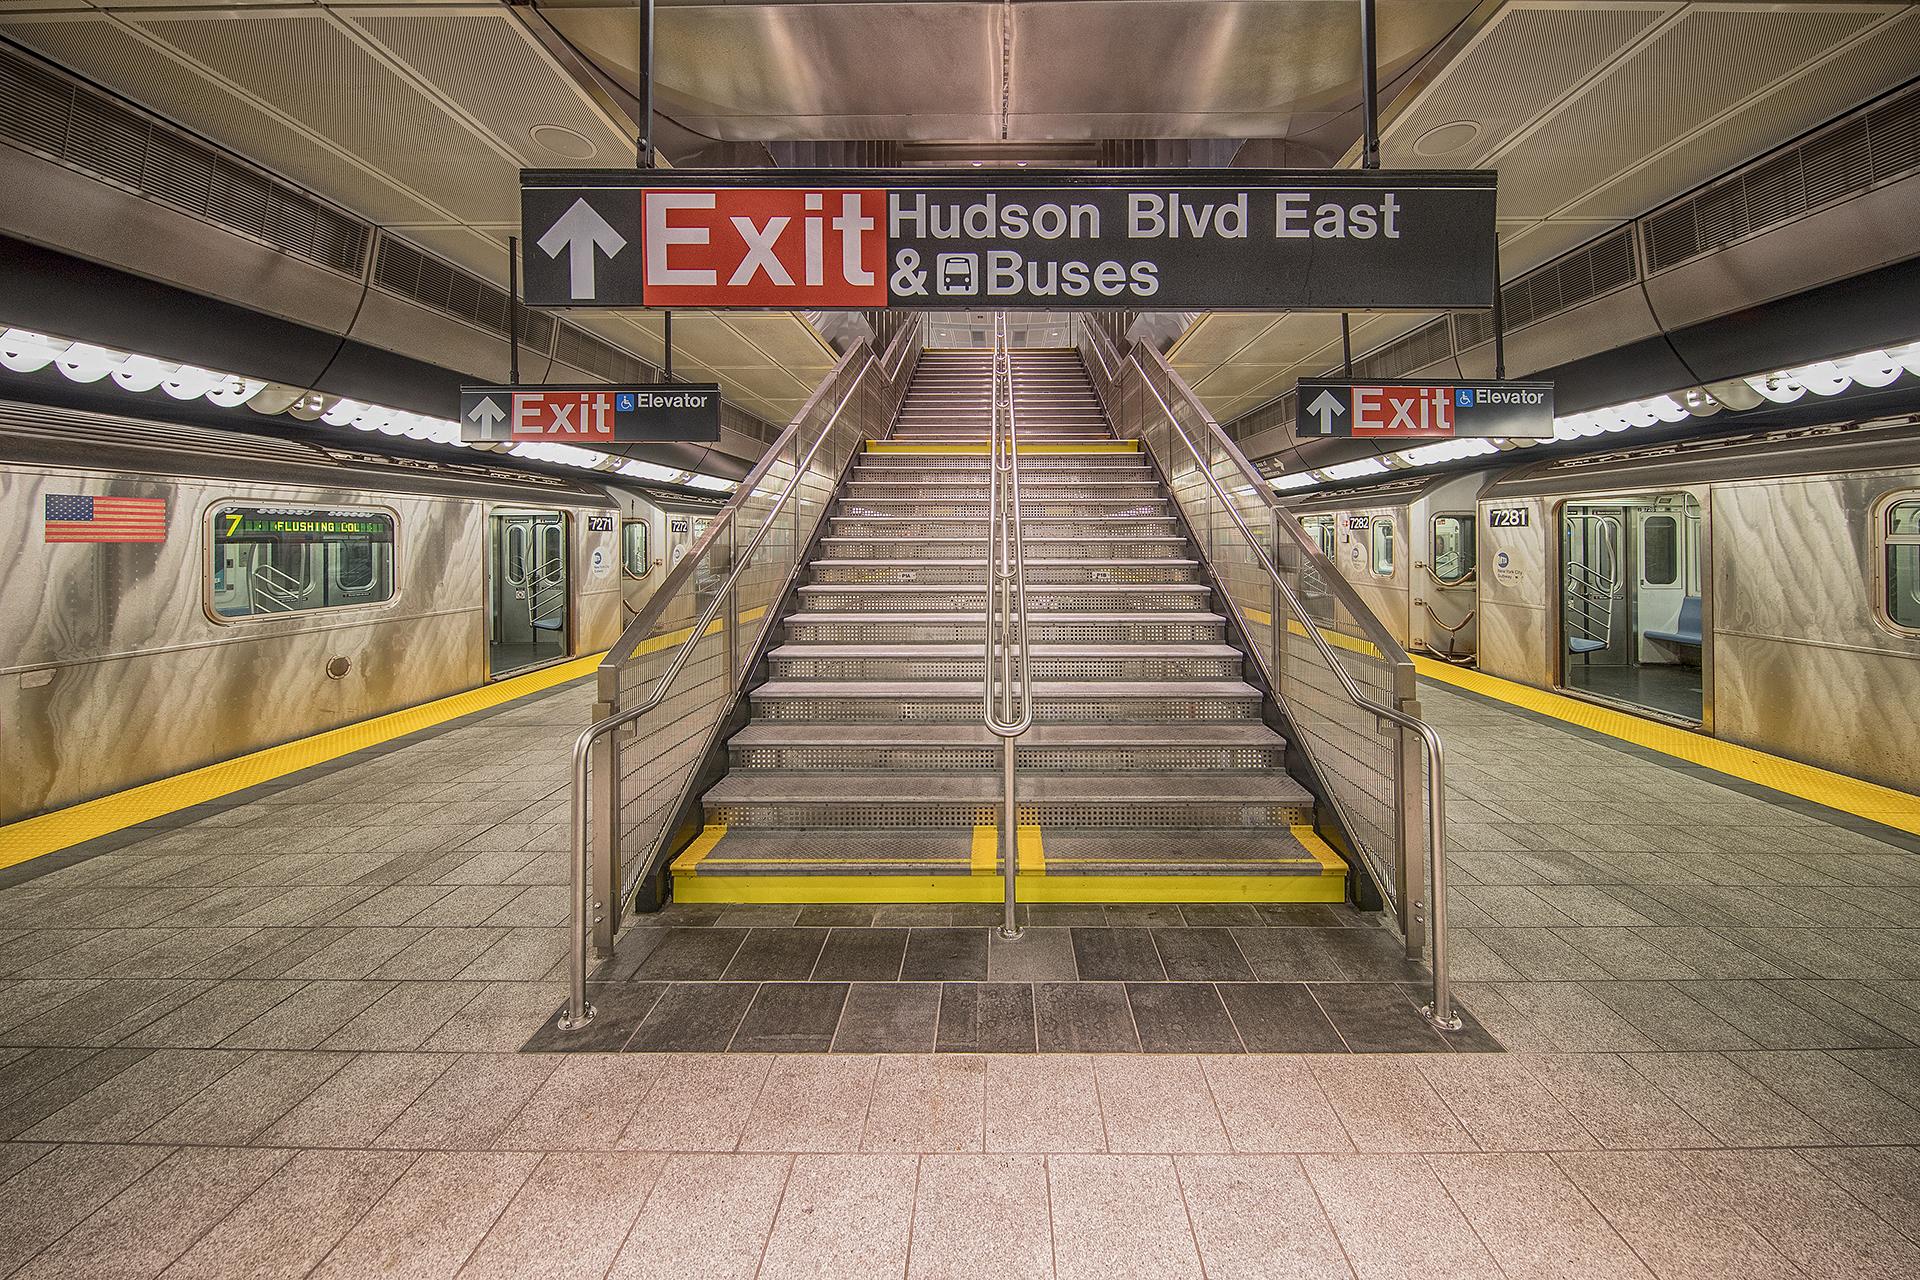 Hudson Boulevard Subway, New York